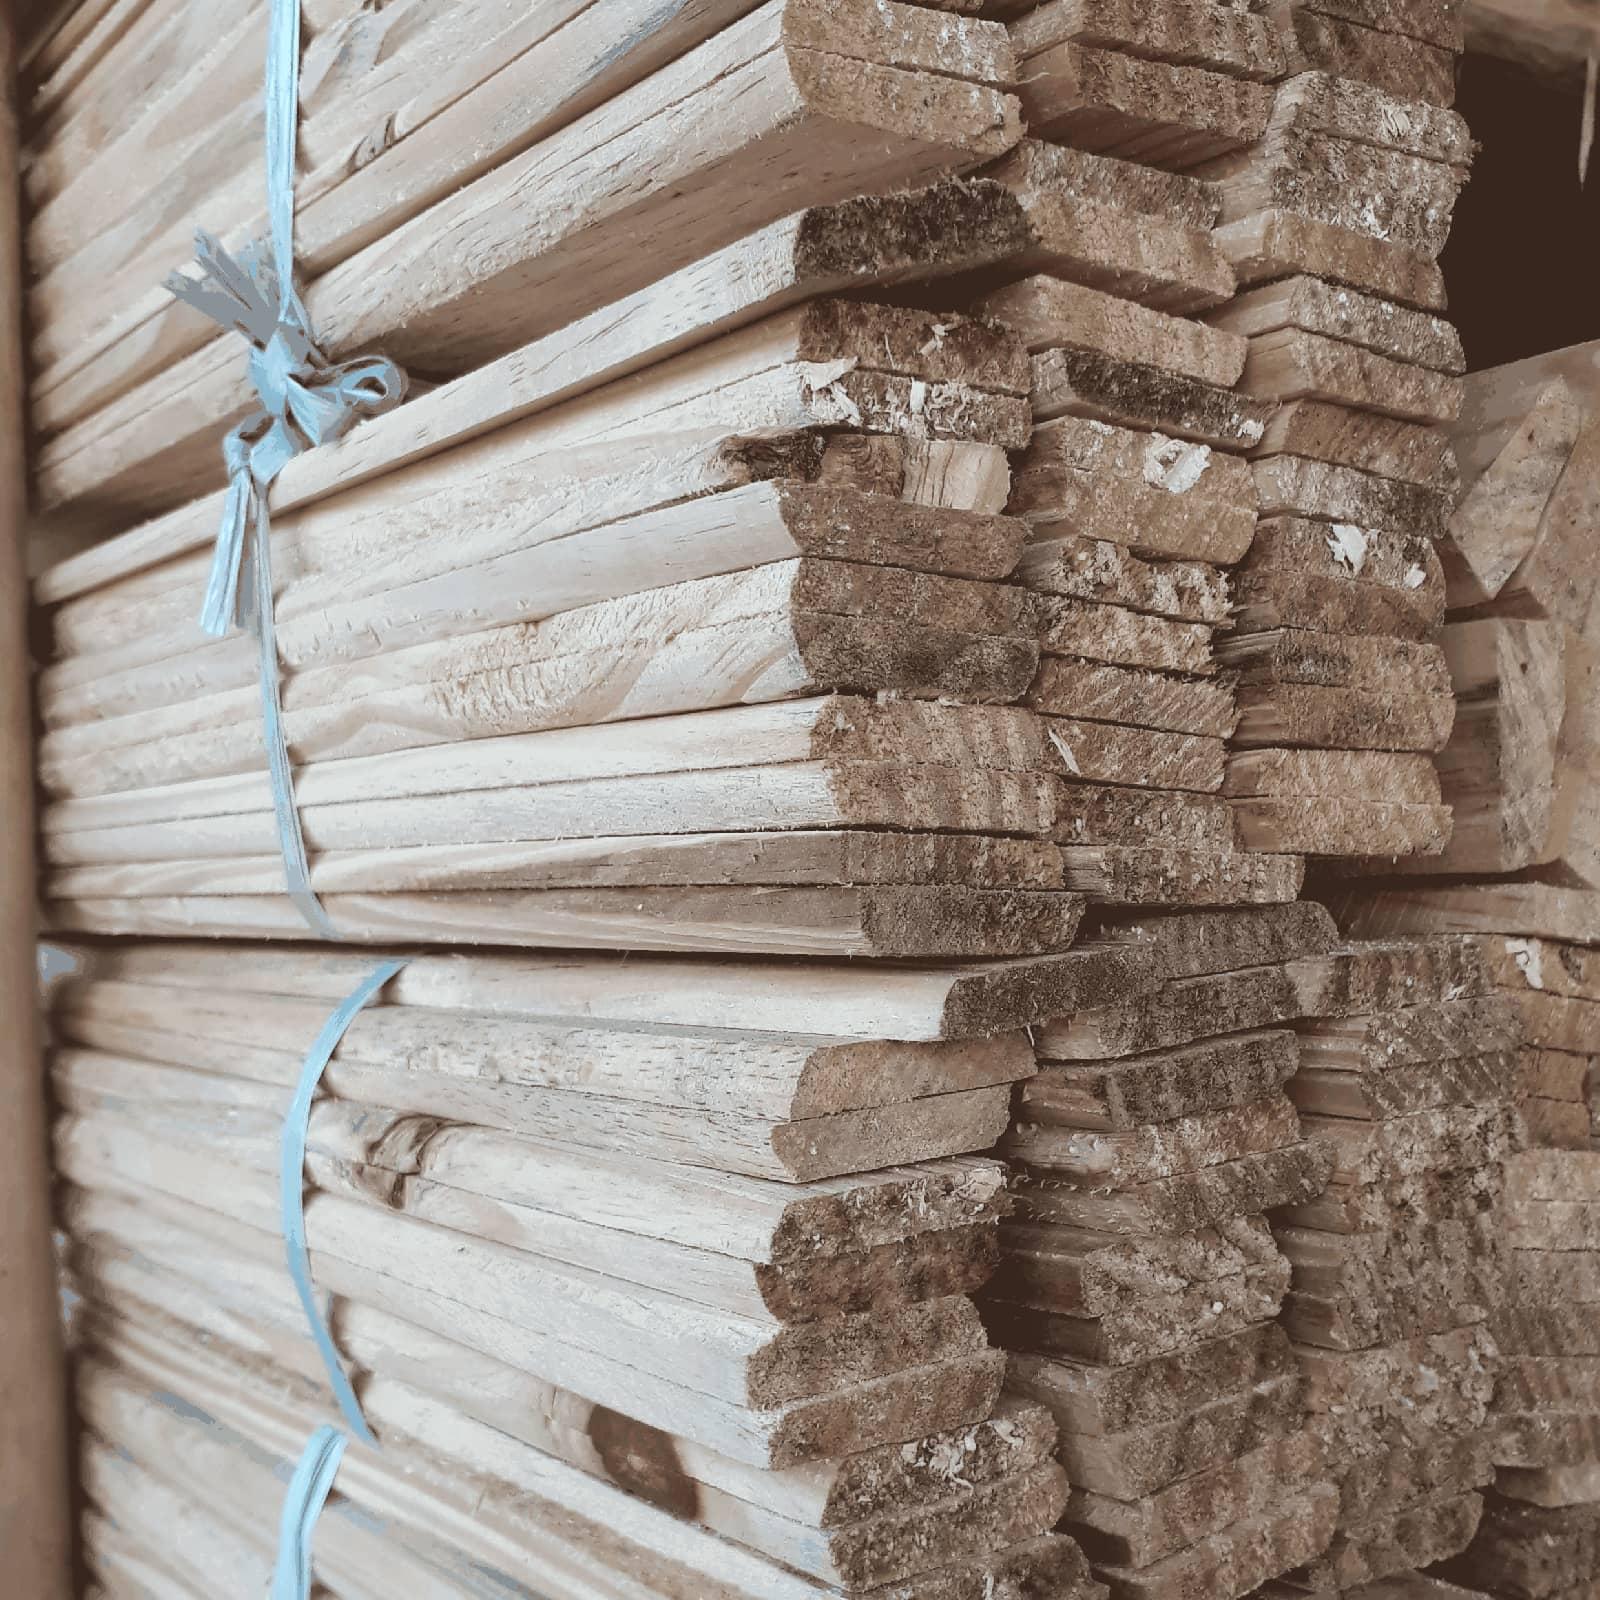 Matajunta de Pinus Natural Beneficiada